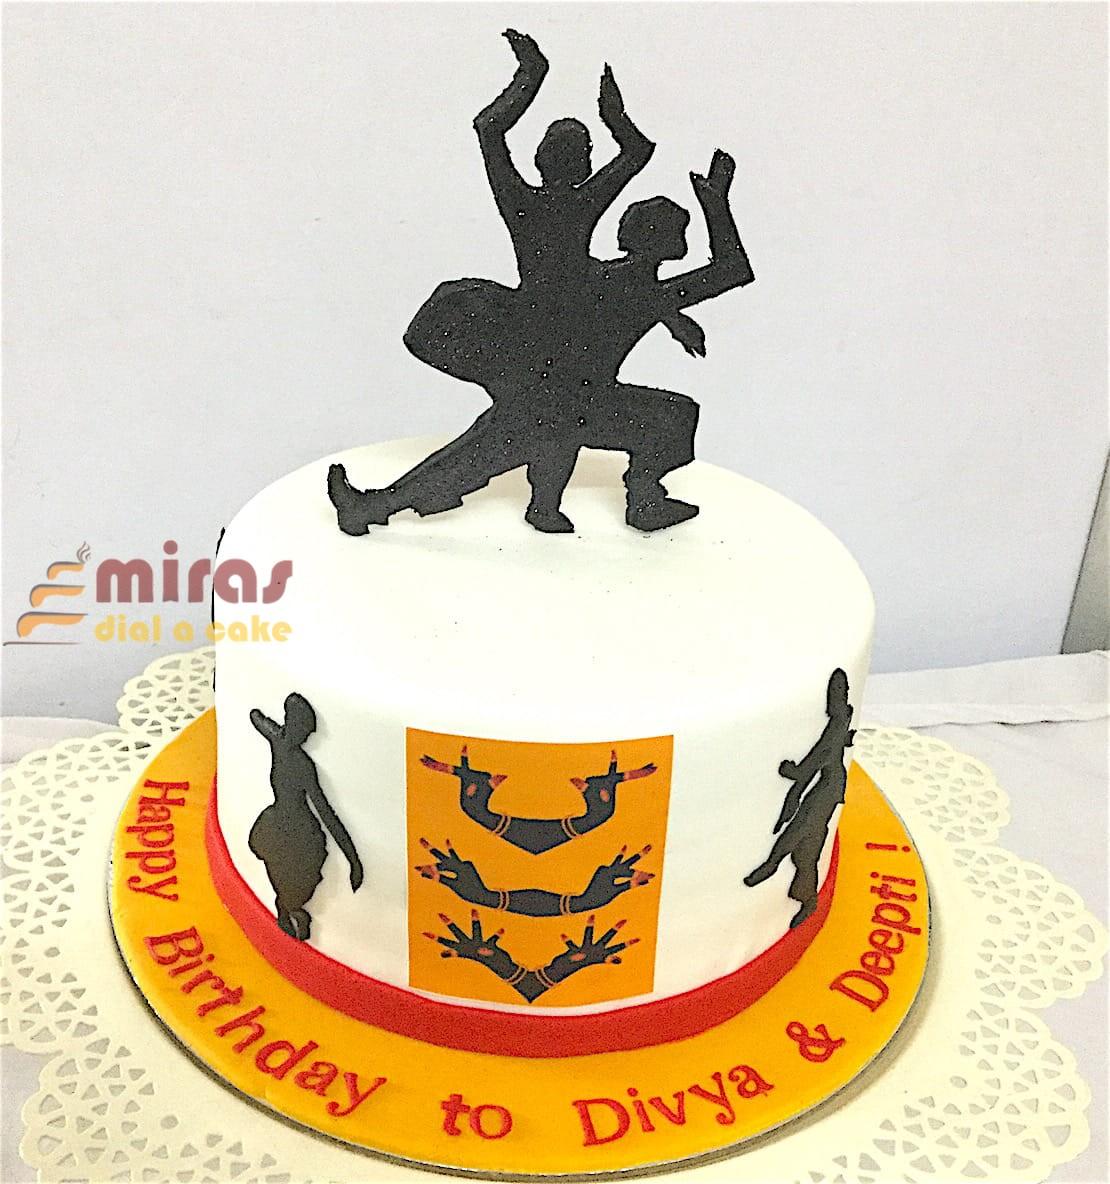 Music Dance Theme Cakes Online l Birthday Cakes l Bangalore l MIRAS